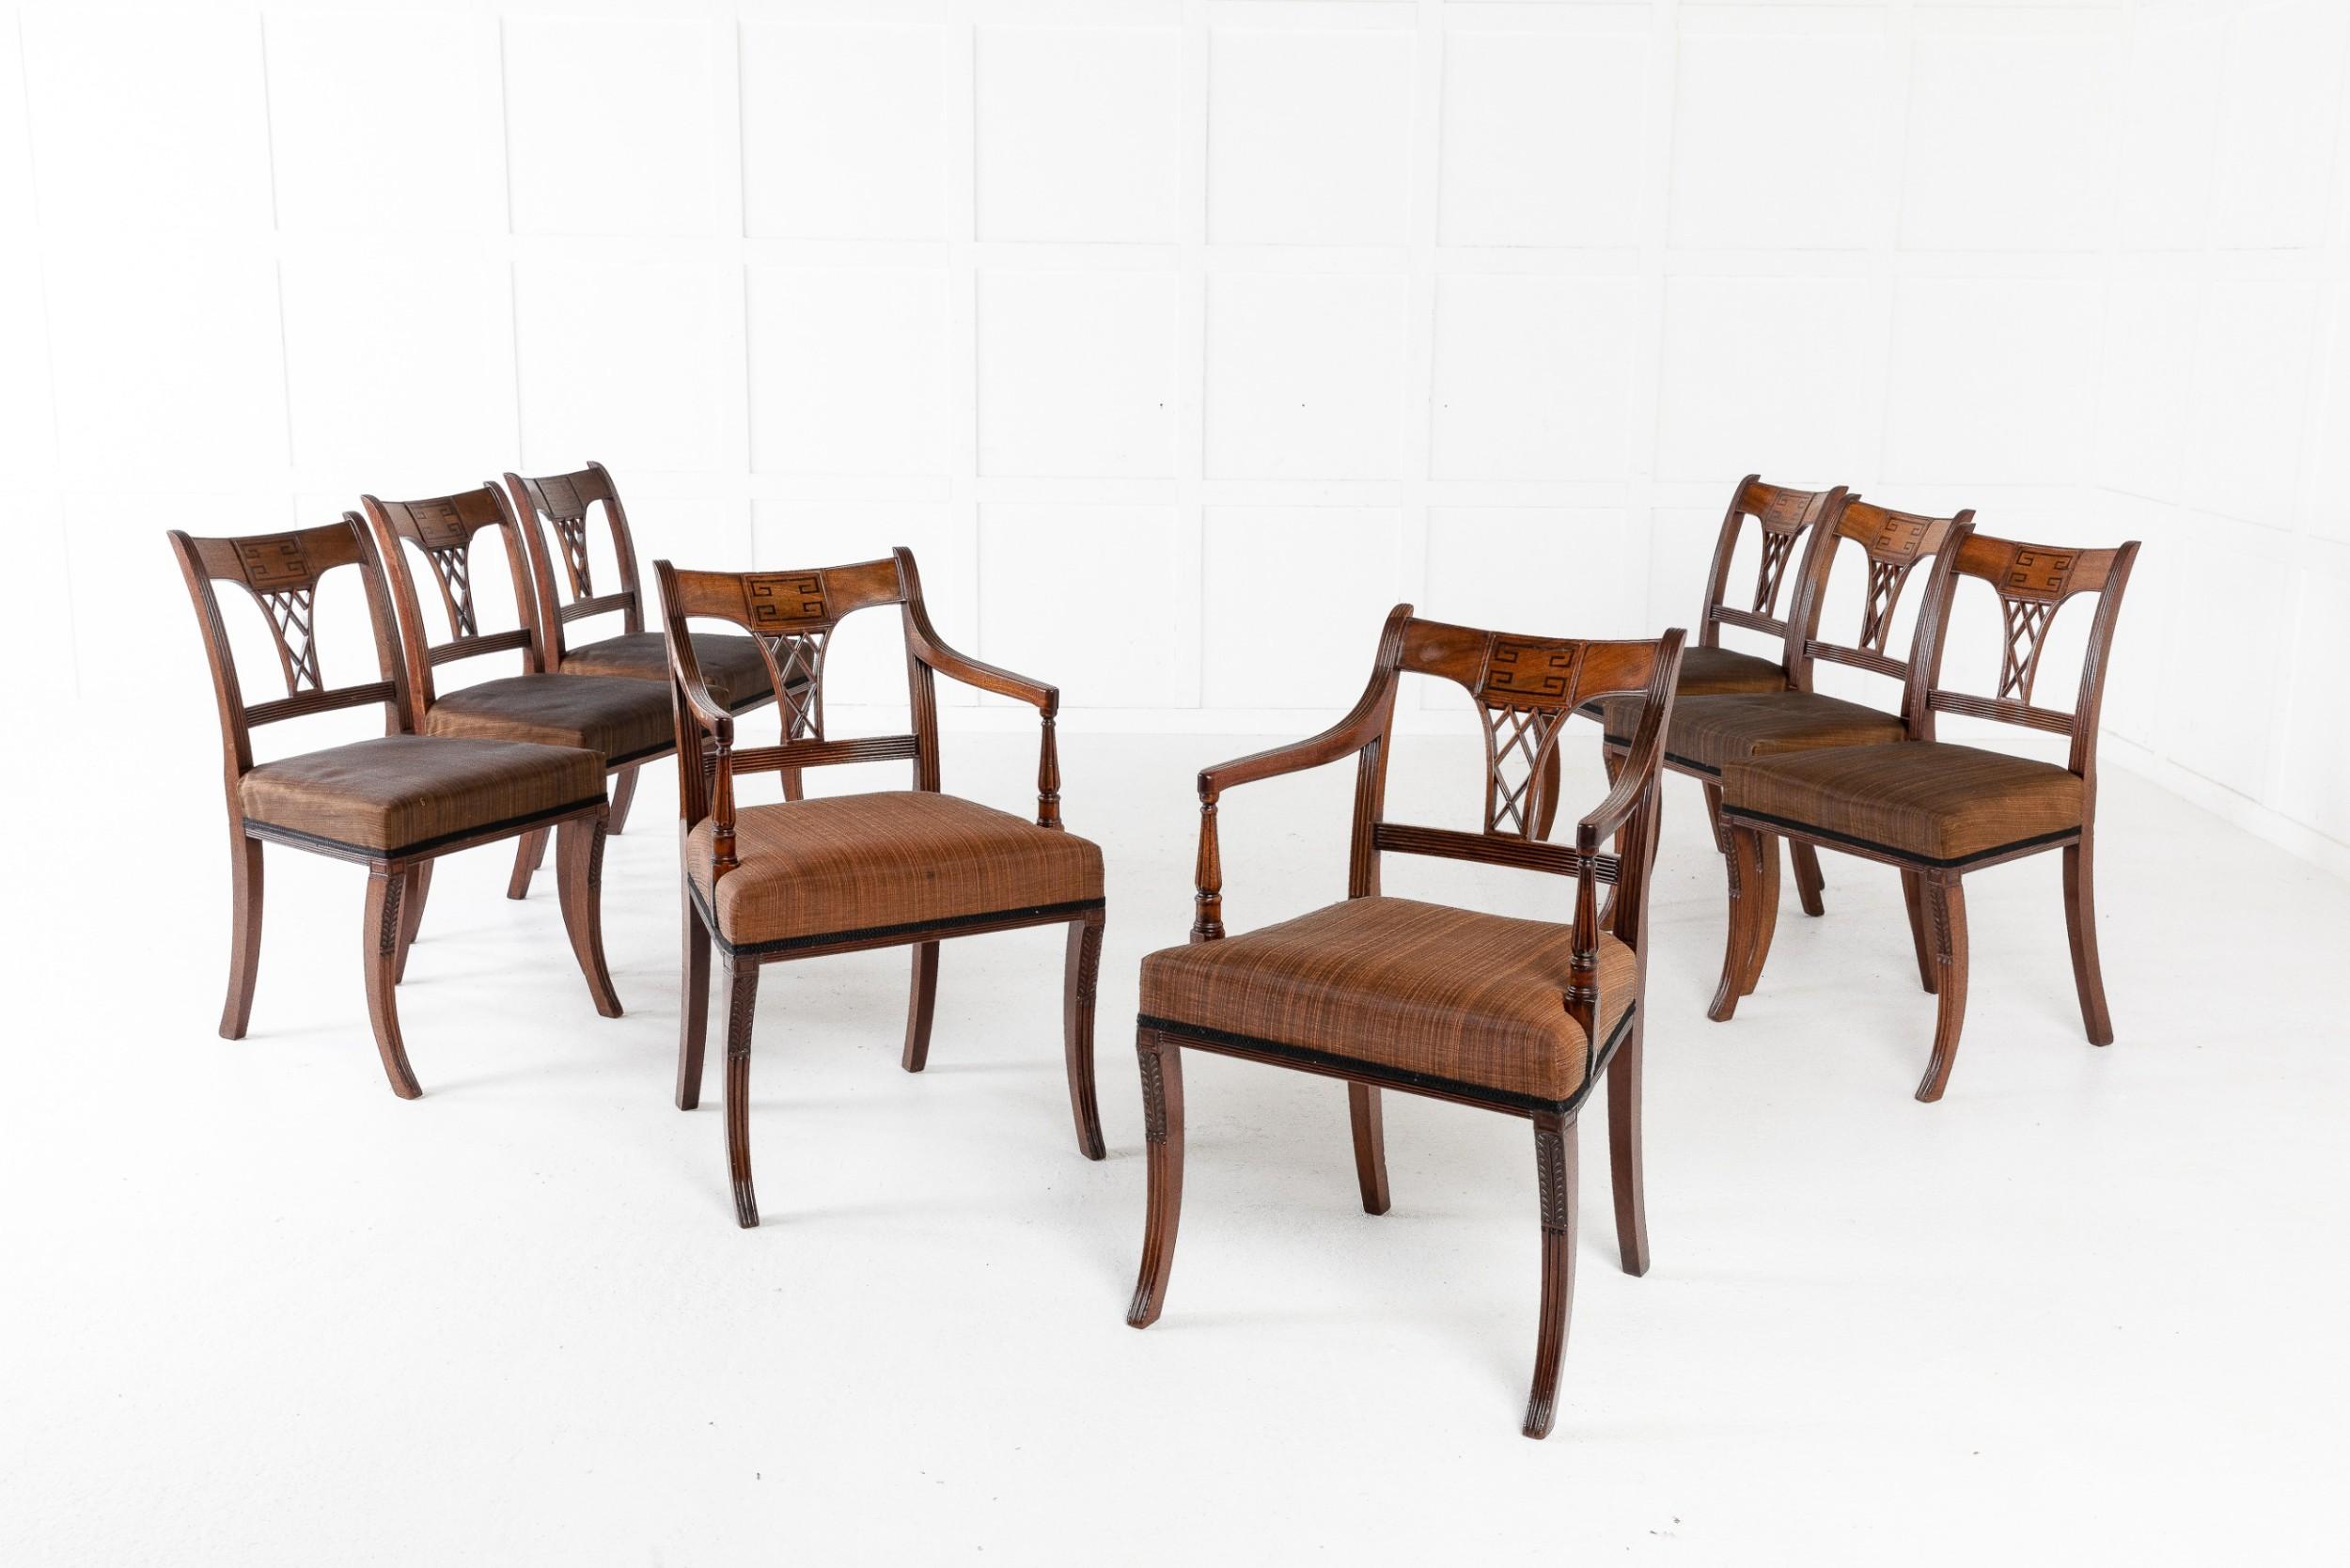 set of eight 19th century regency mahogany dining chairs